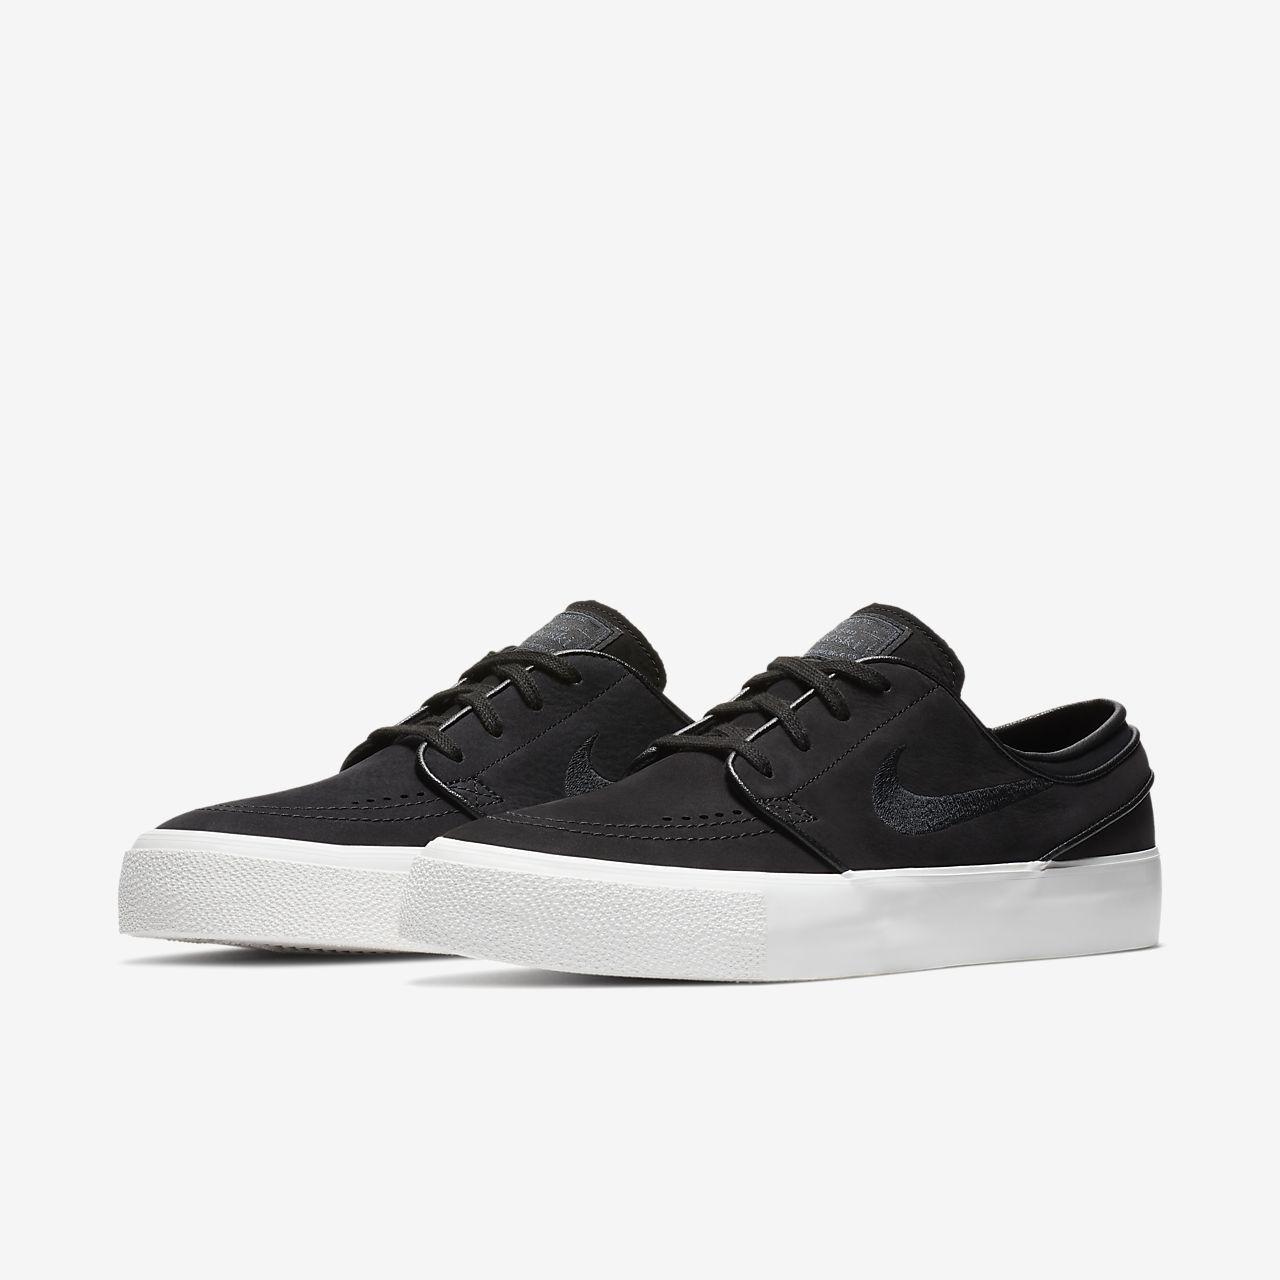 New Men's Nike SB Zoom Stefan Janoski CNVS Size 10 Grey Light Bone Skate Shoes